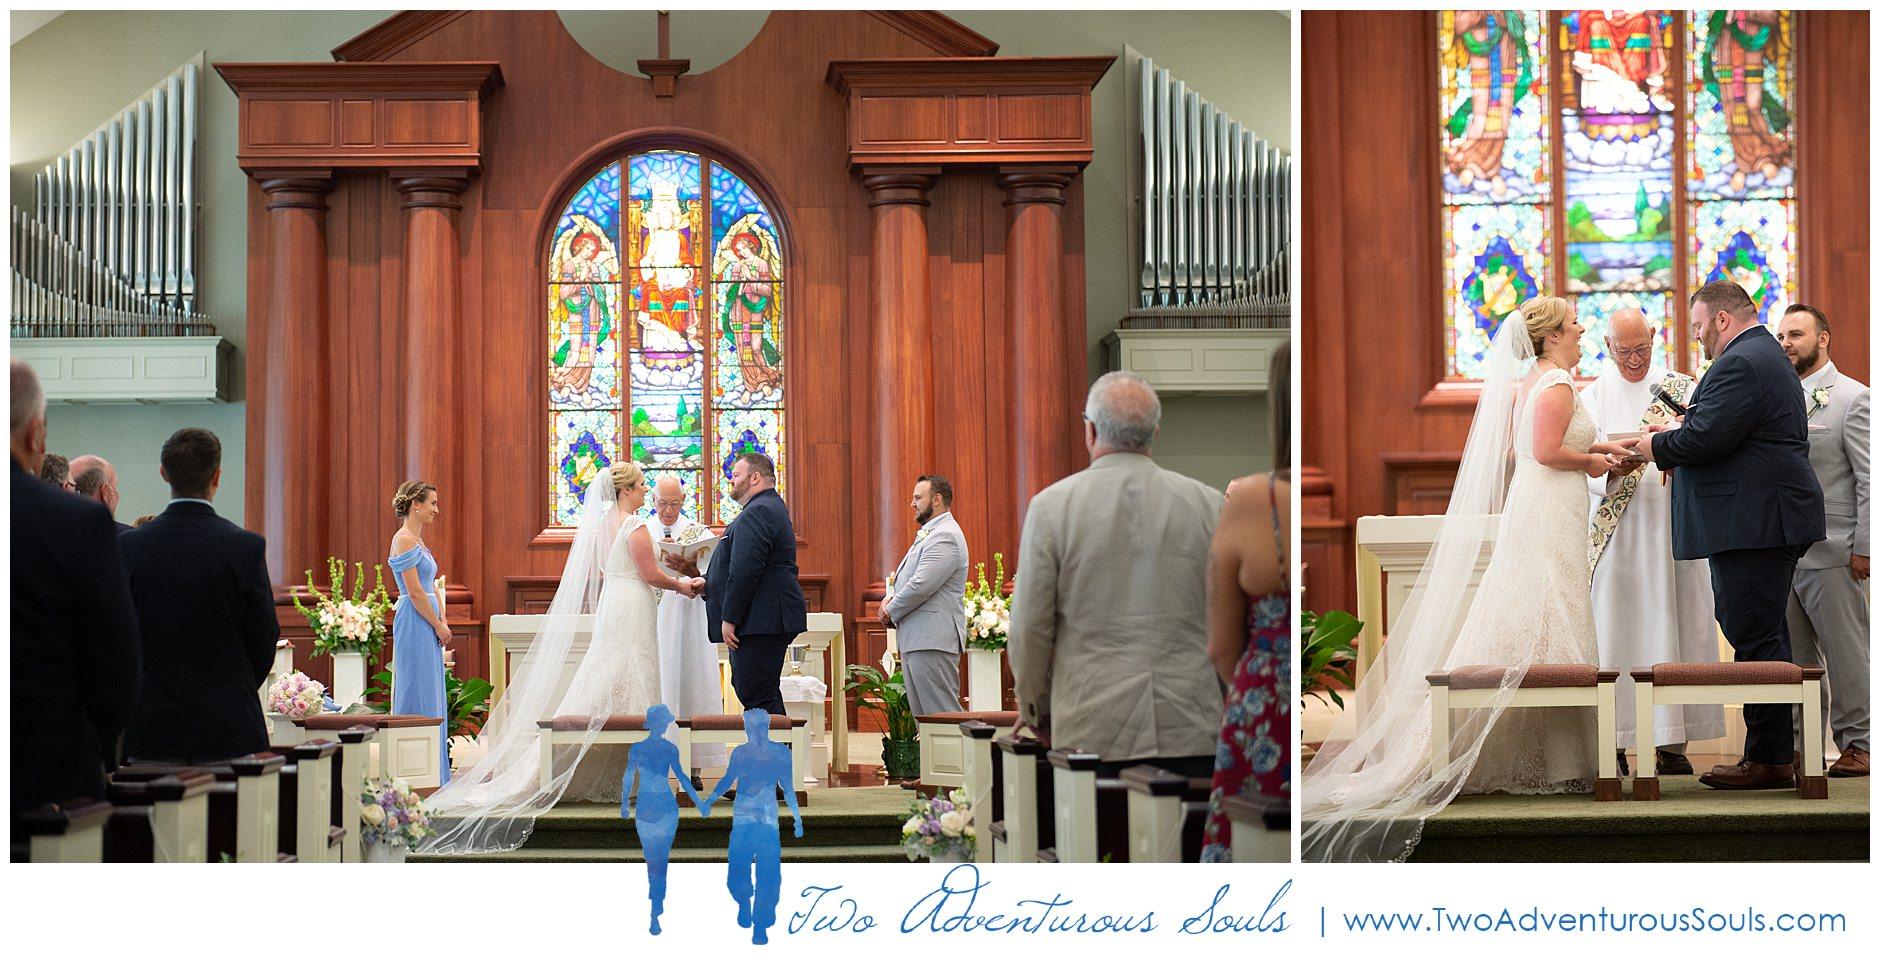 Cape Cod Wedding Photographers, Destination Wedding Photographers, Two Adventurous Souls-081019_0024.jpg